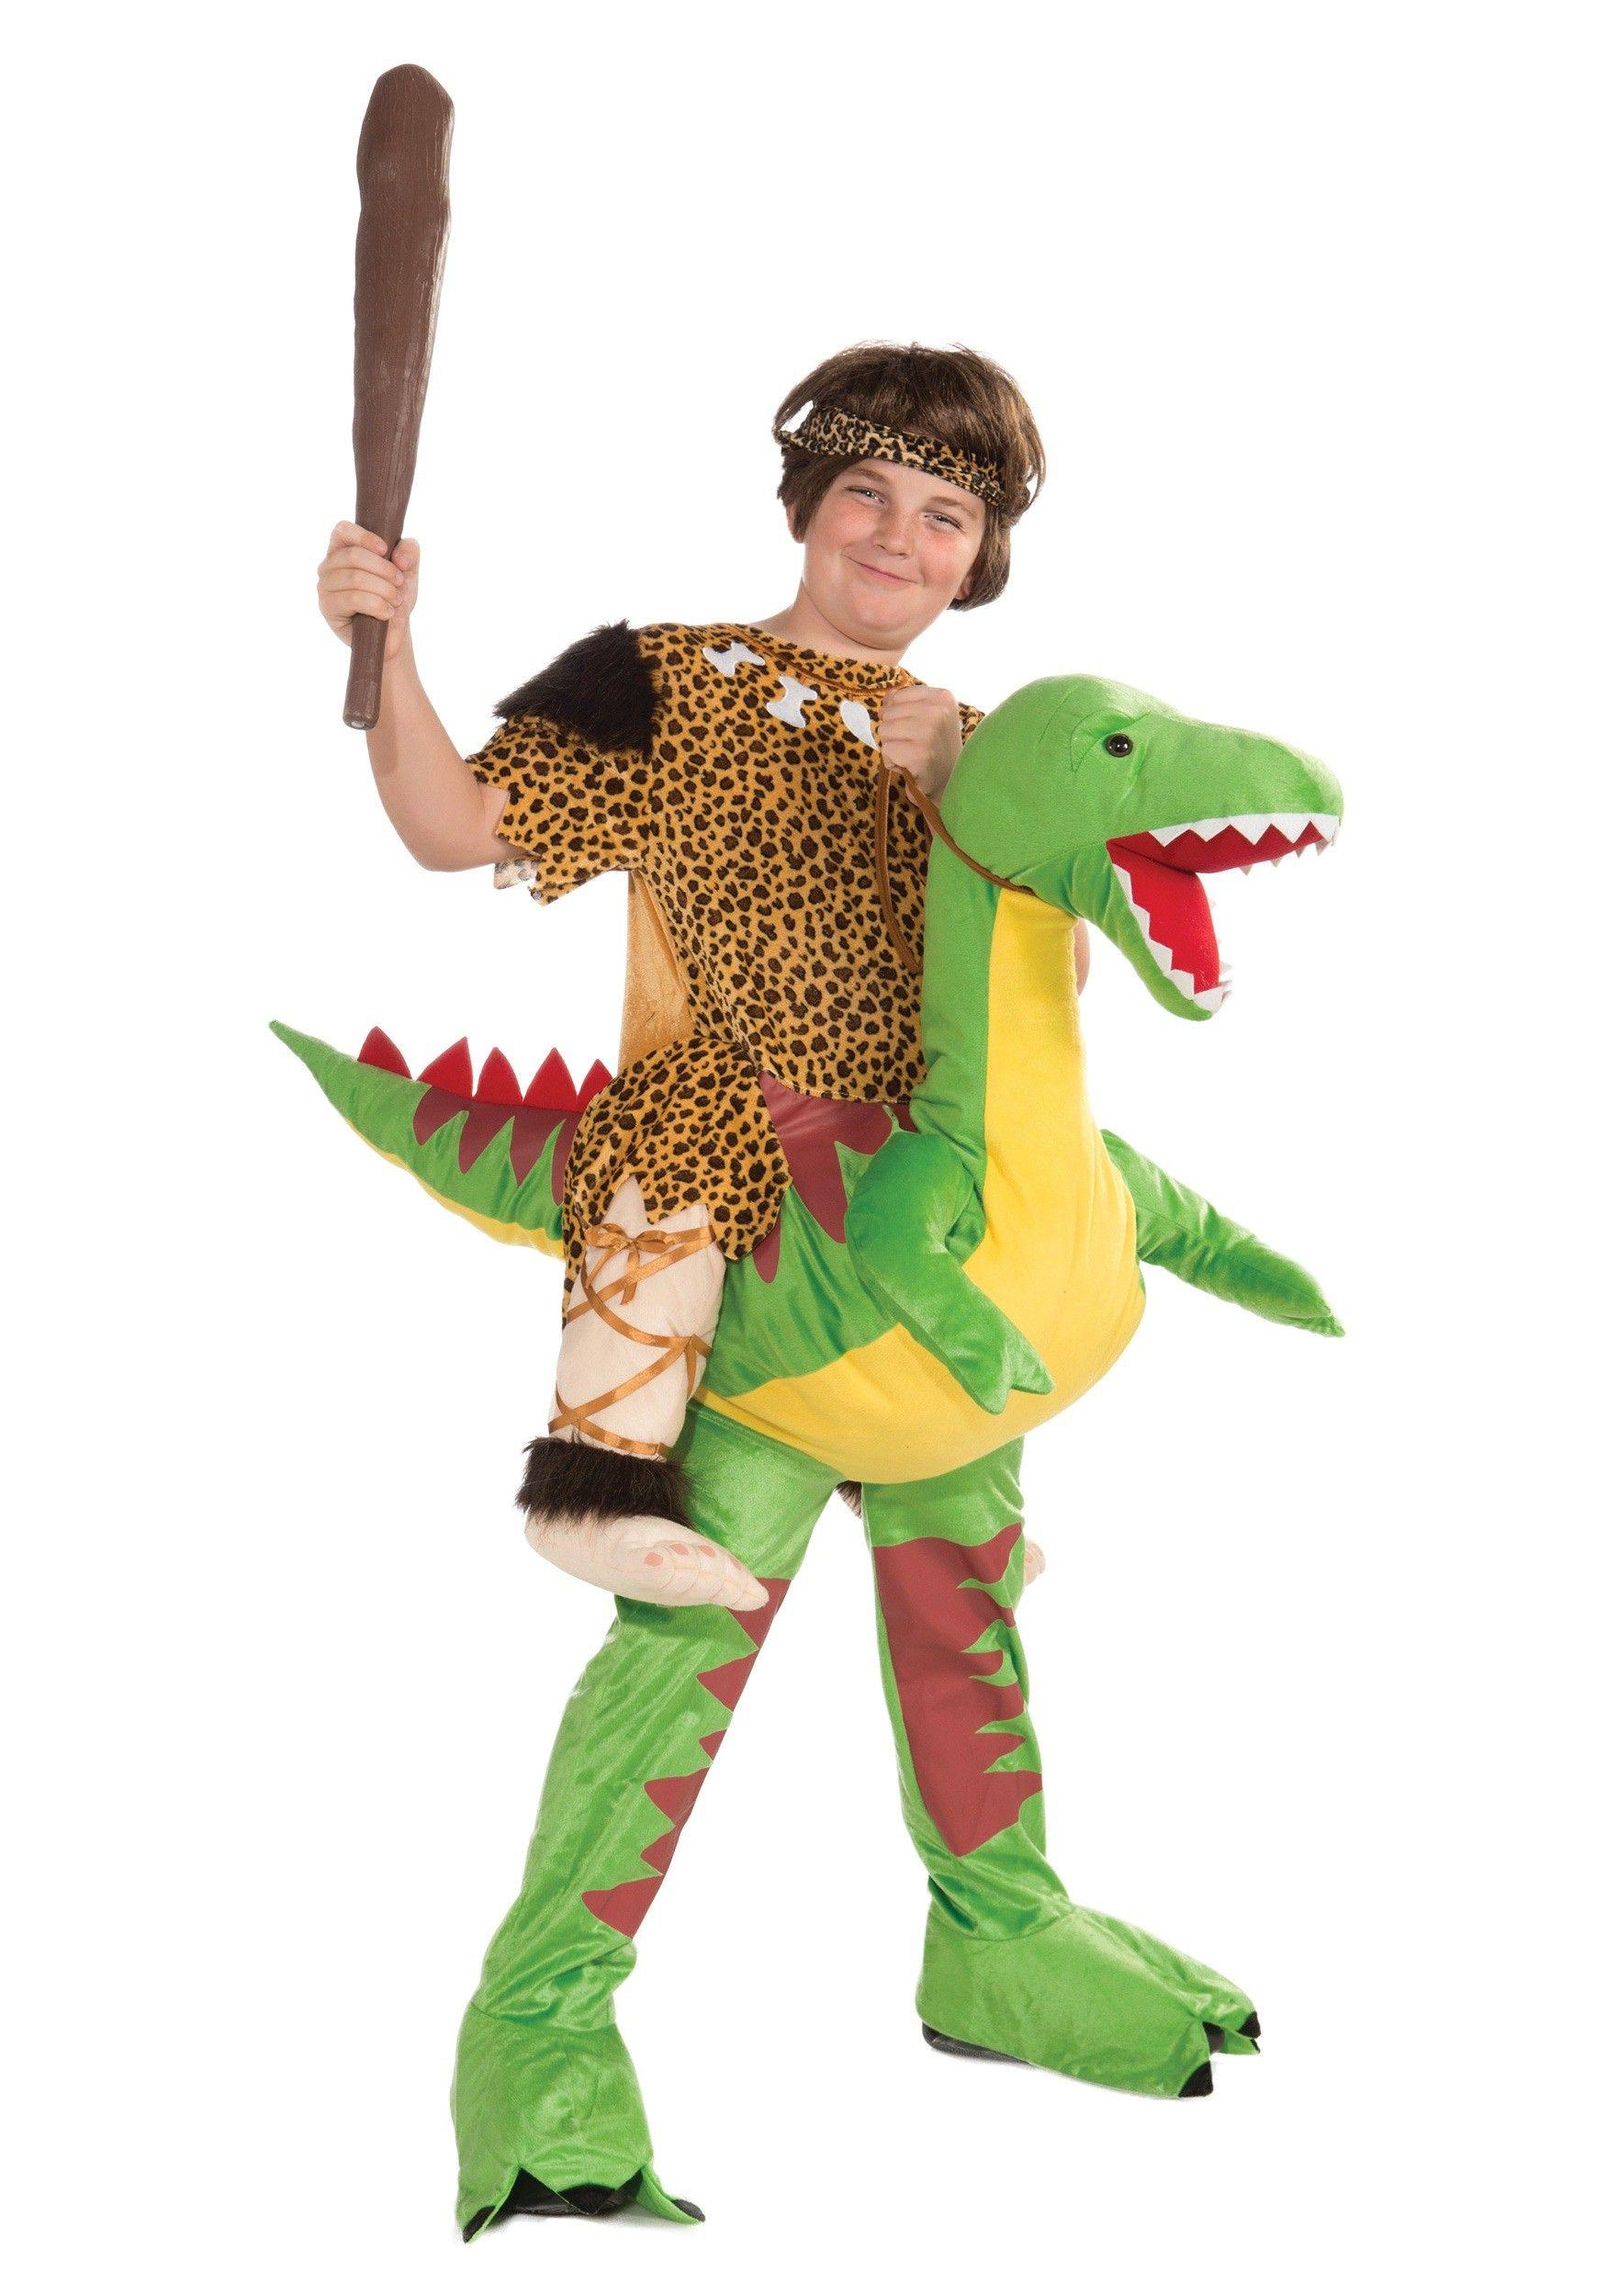 Child Ride A Dinosaur Costume Dinosaur Halloween Costume Halloween Party Outfits Boy Costumes